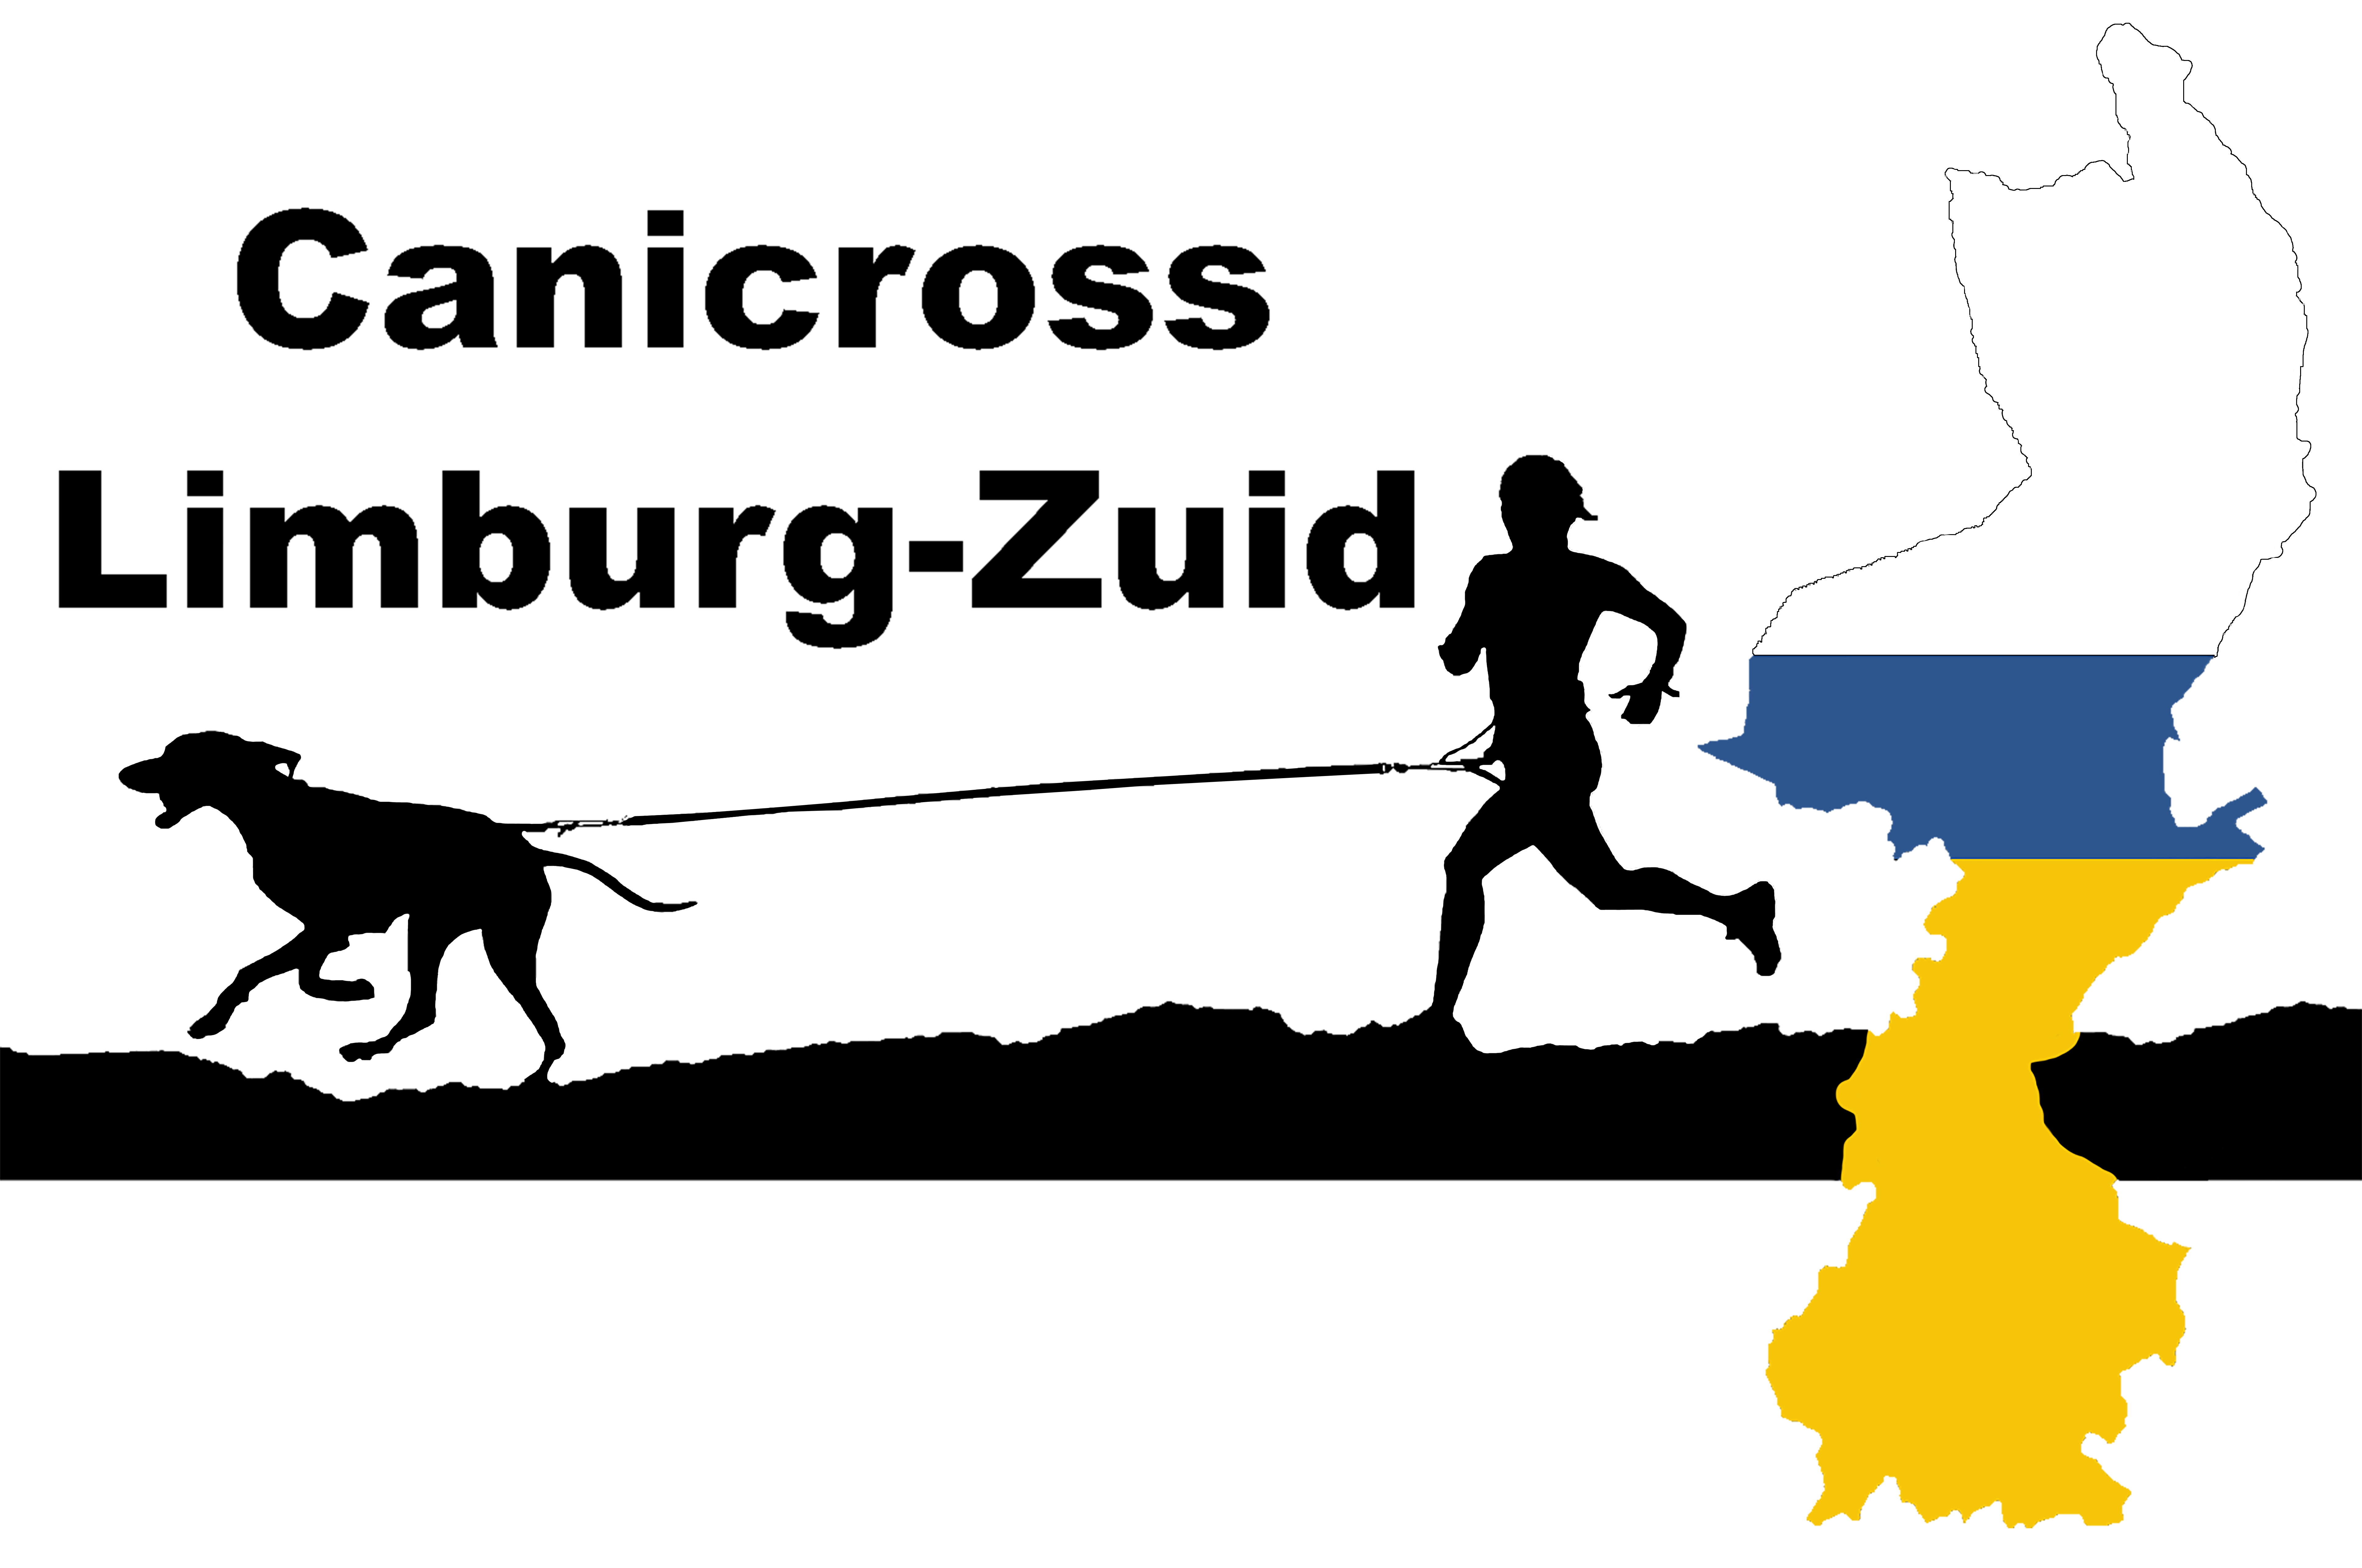 Canicross Limburg-Zuid